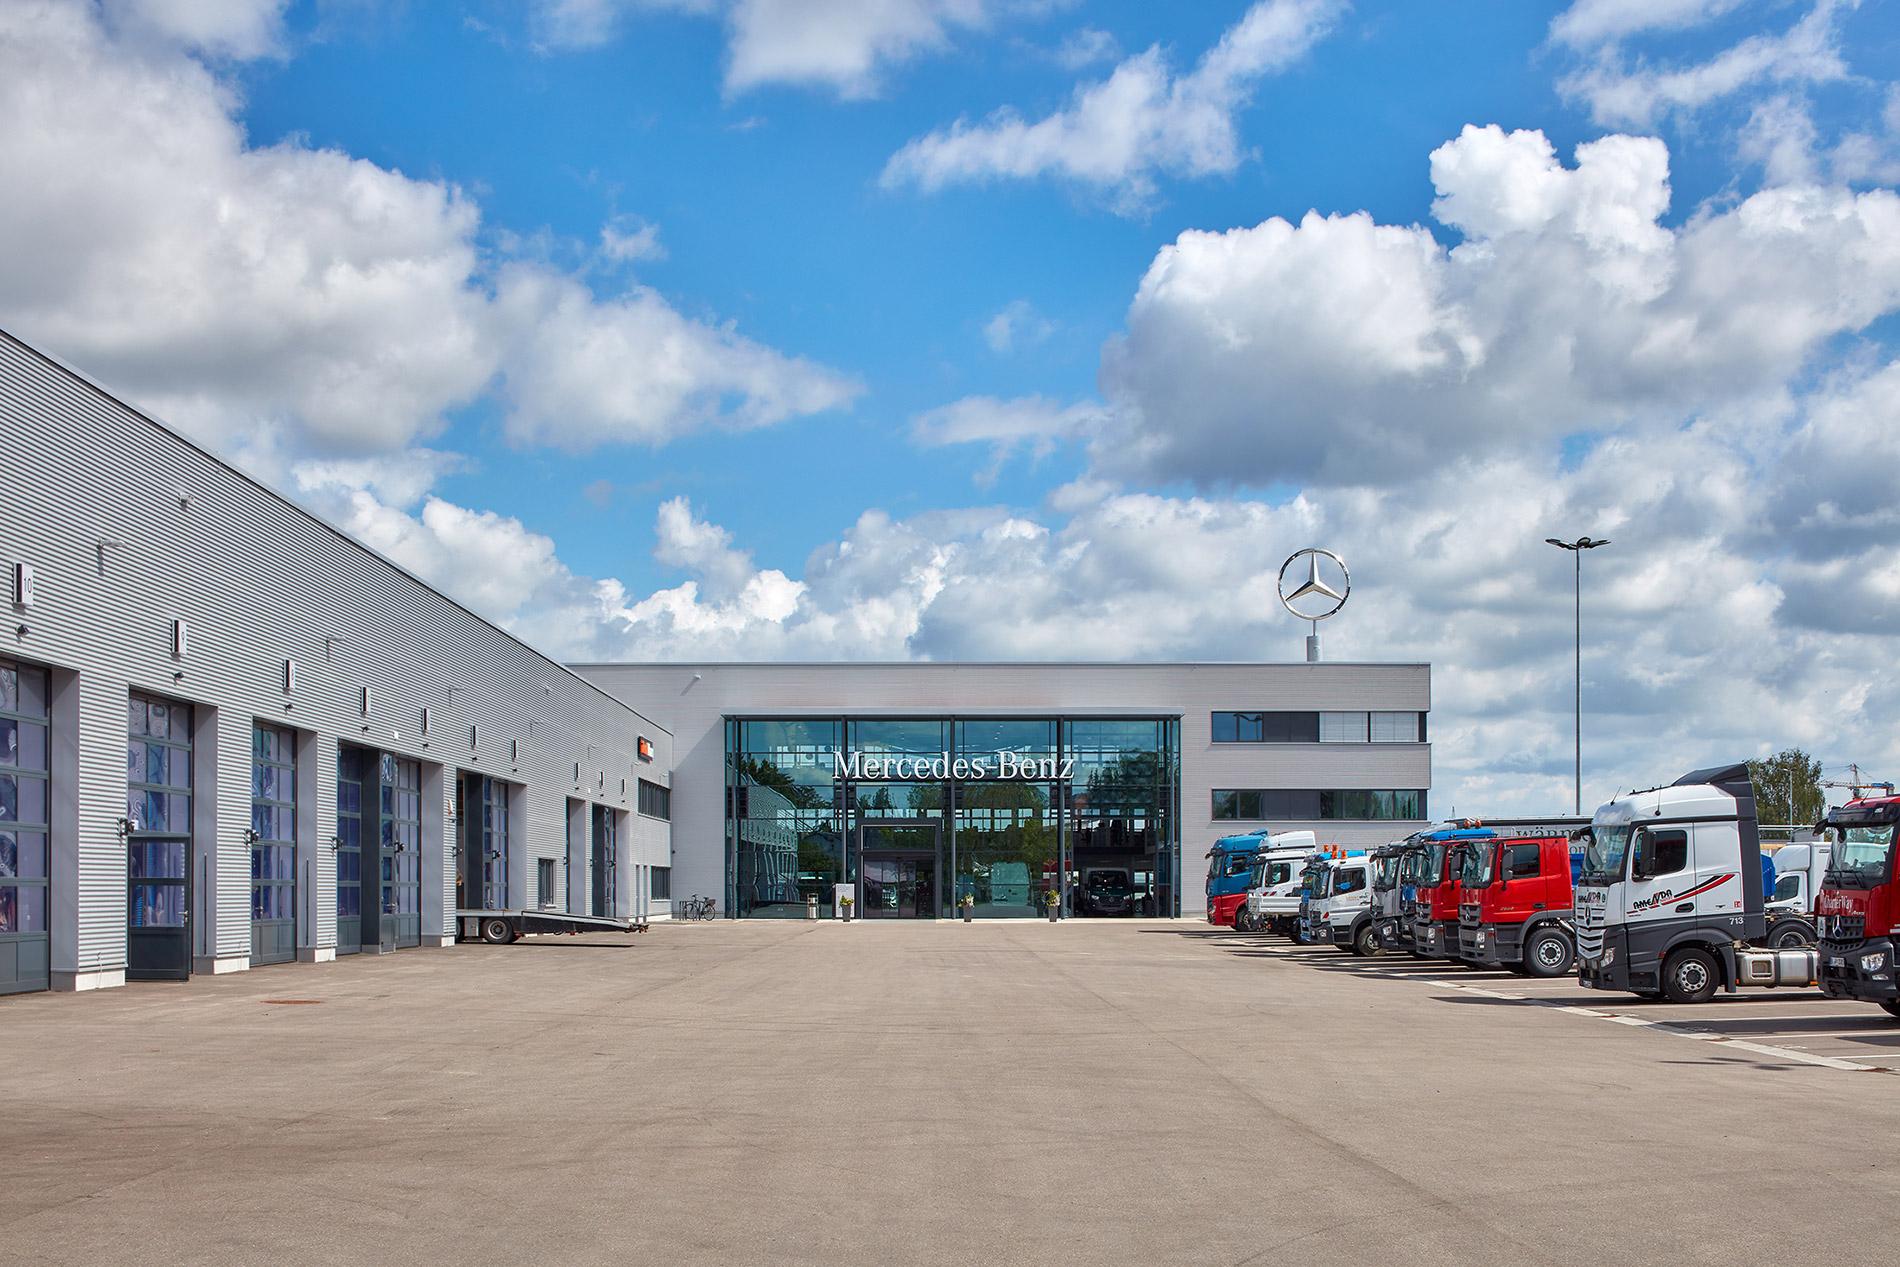 2018, Neubau Mercedes-Benz Nutzfahrzeugzentrum, Neu-Ulm